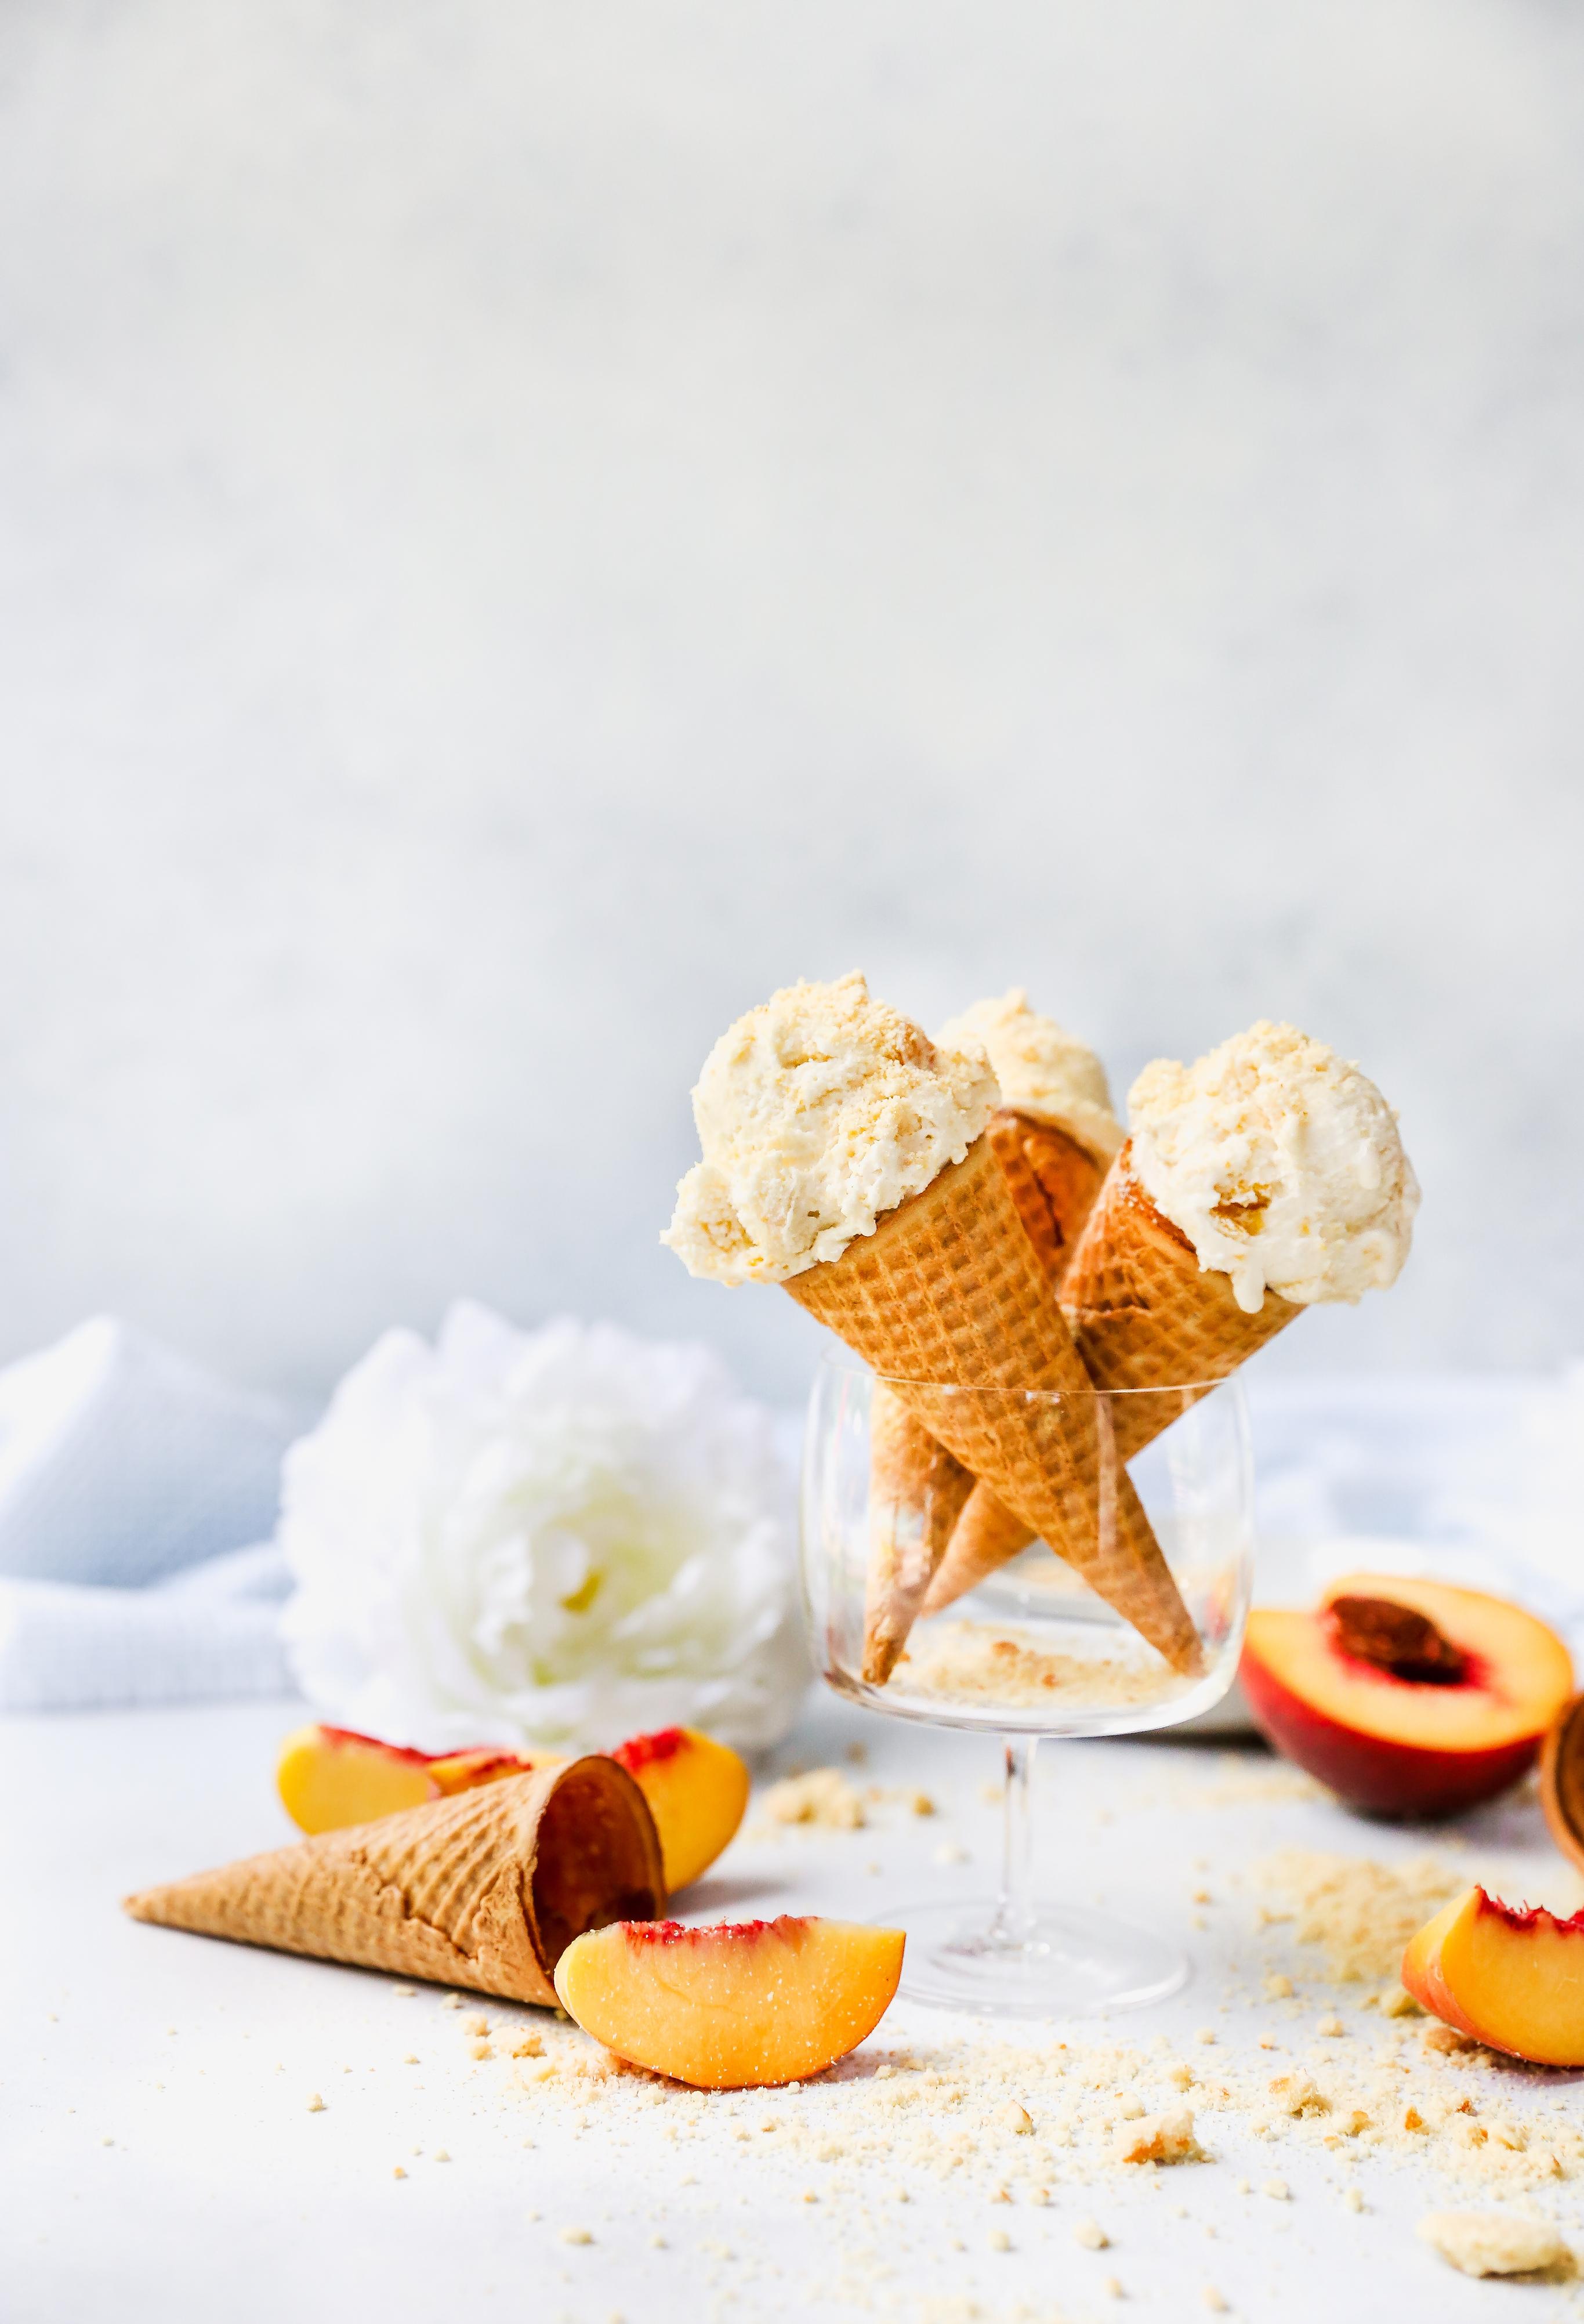 Peaches & Cream Ice Cream with Cookie Crumble